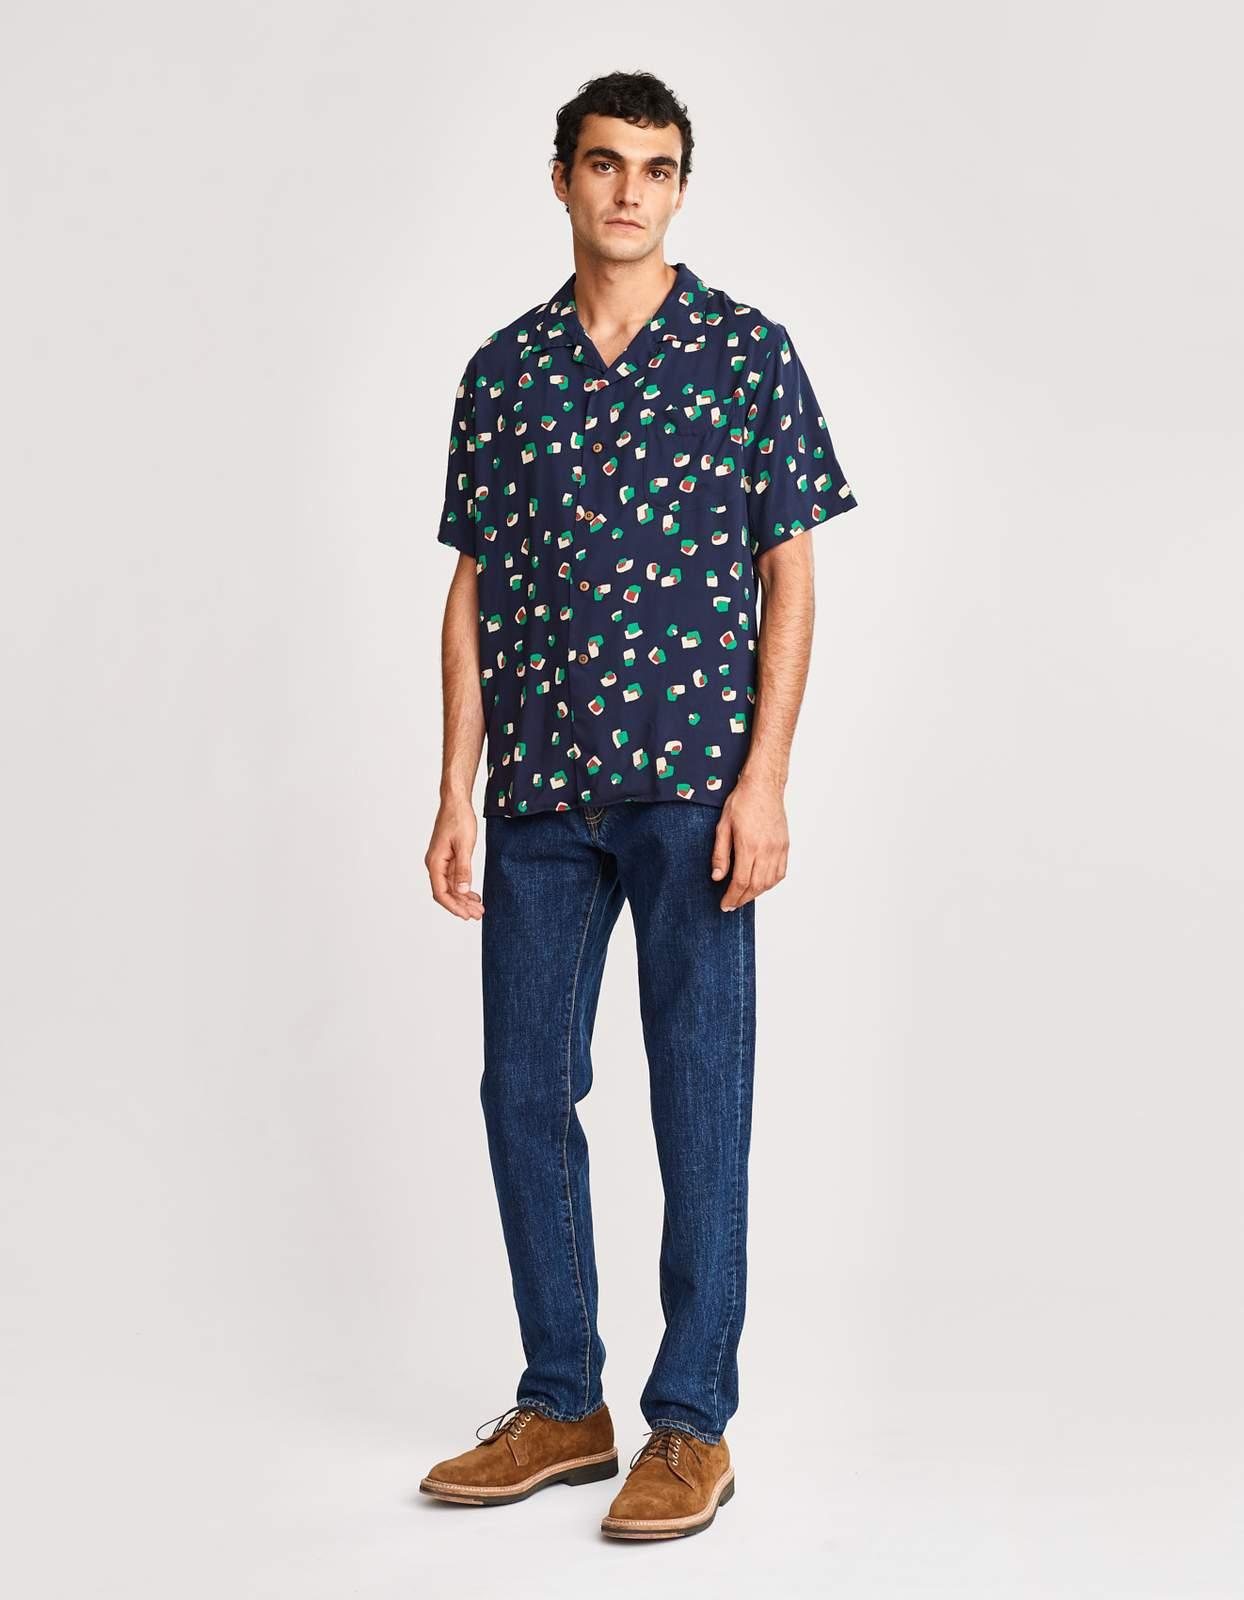 BLR-shirt-gowai-f1667-combo-1_30_1600x1600.jpg